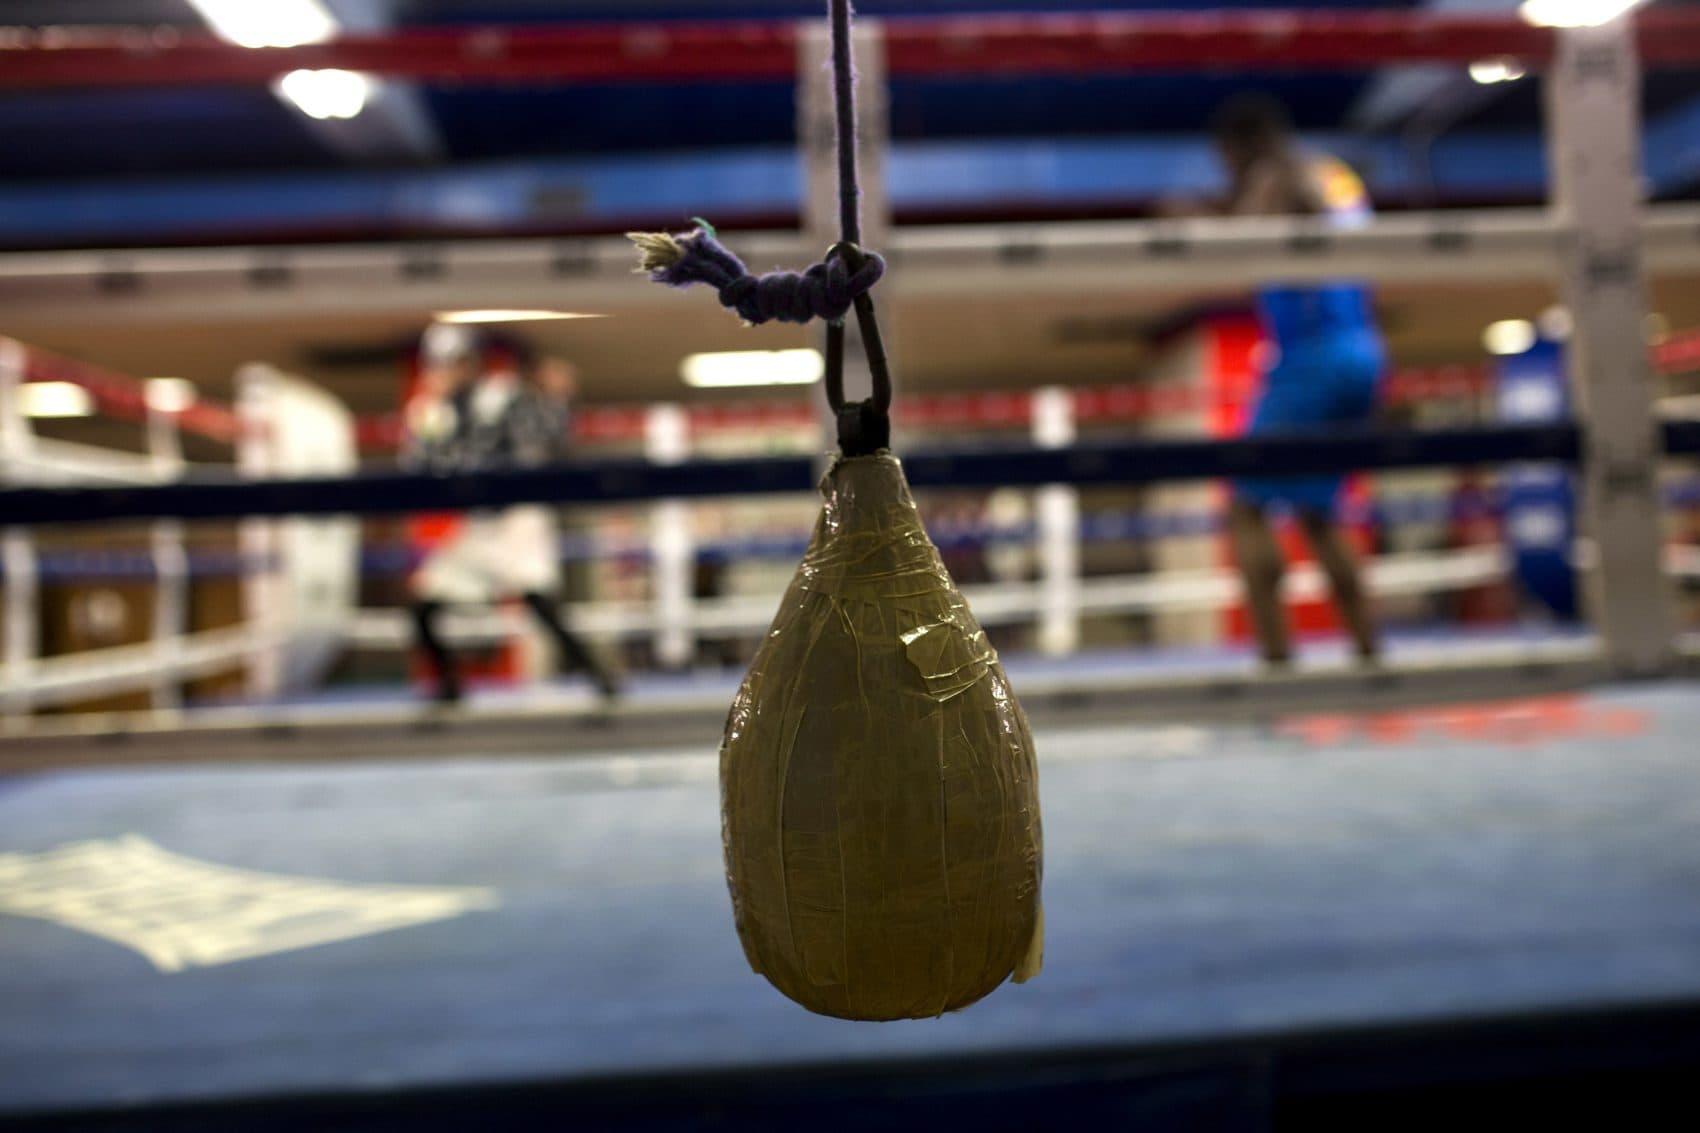 """I had this fierce desire to make something of me life,"" boxer Tony Moran says. (Francisco Seco/AP)"